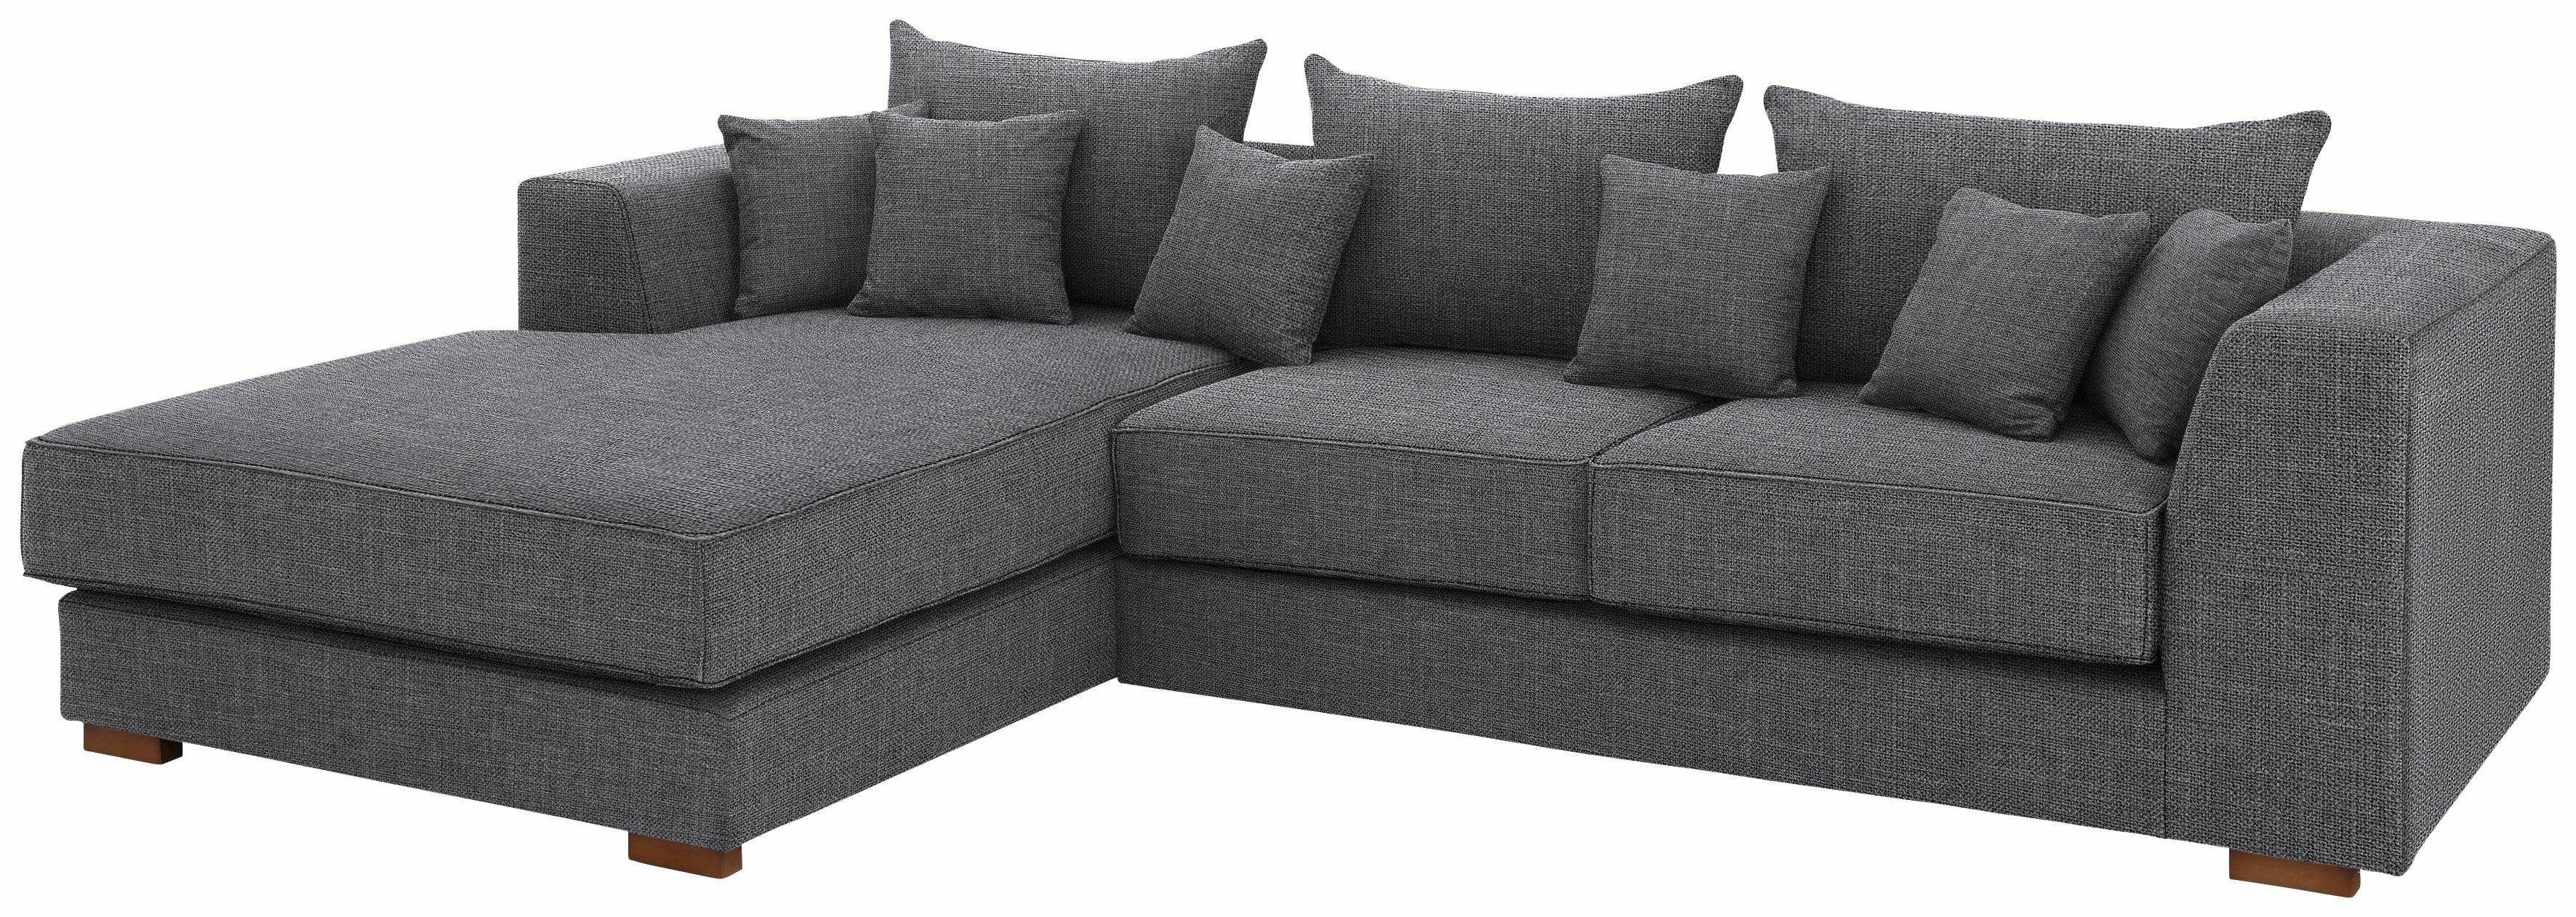 home affaire mbel hersteller good home affaire with home. Black Bedroom Furniture Sets. Home Design Ideas